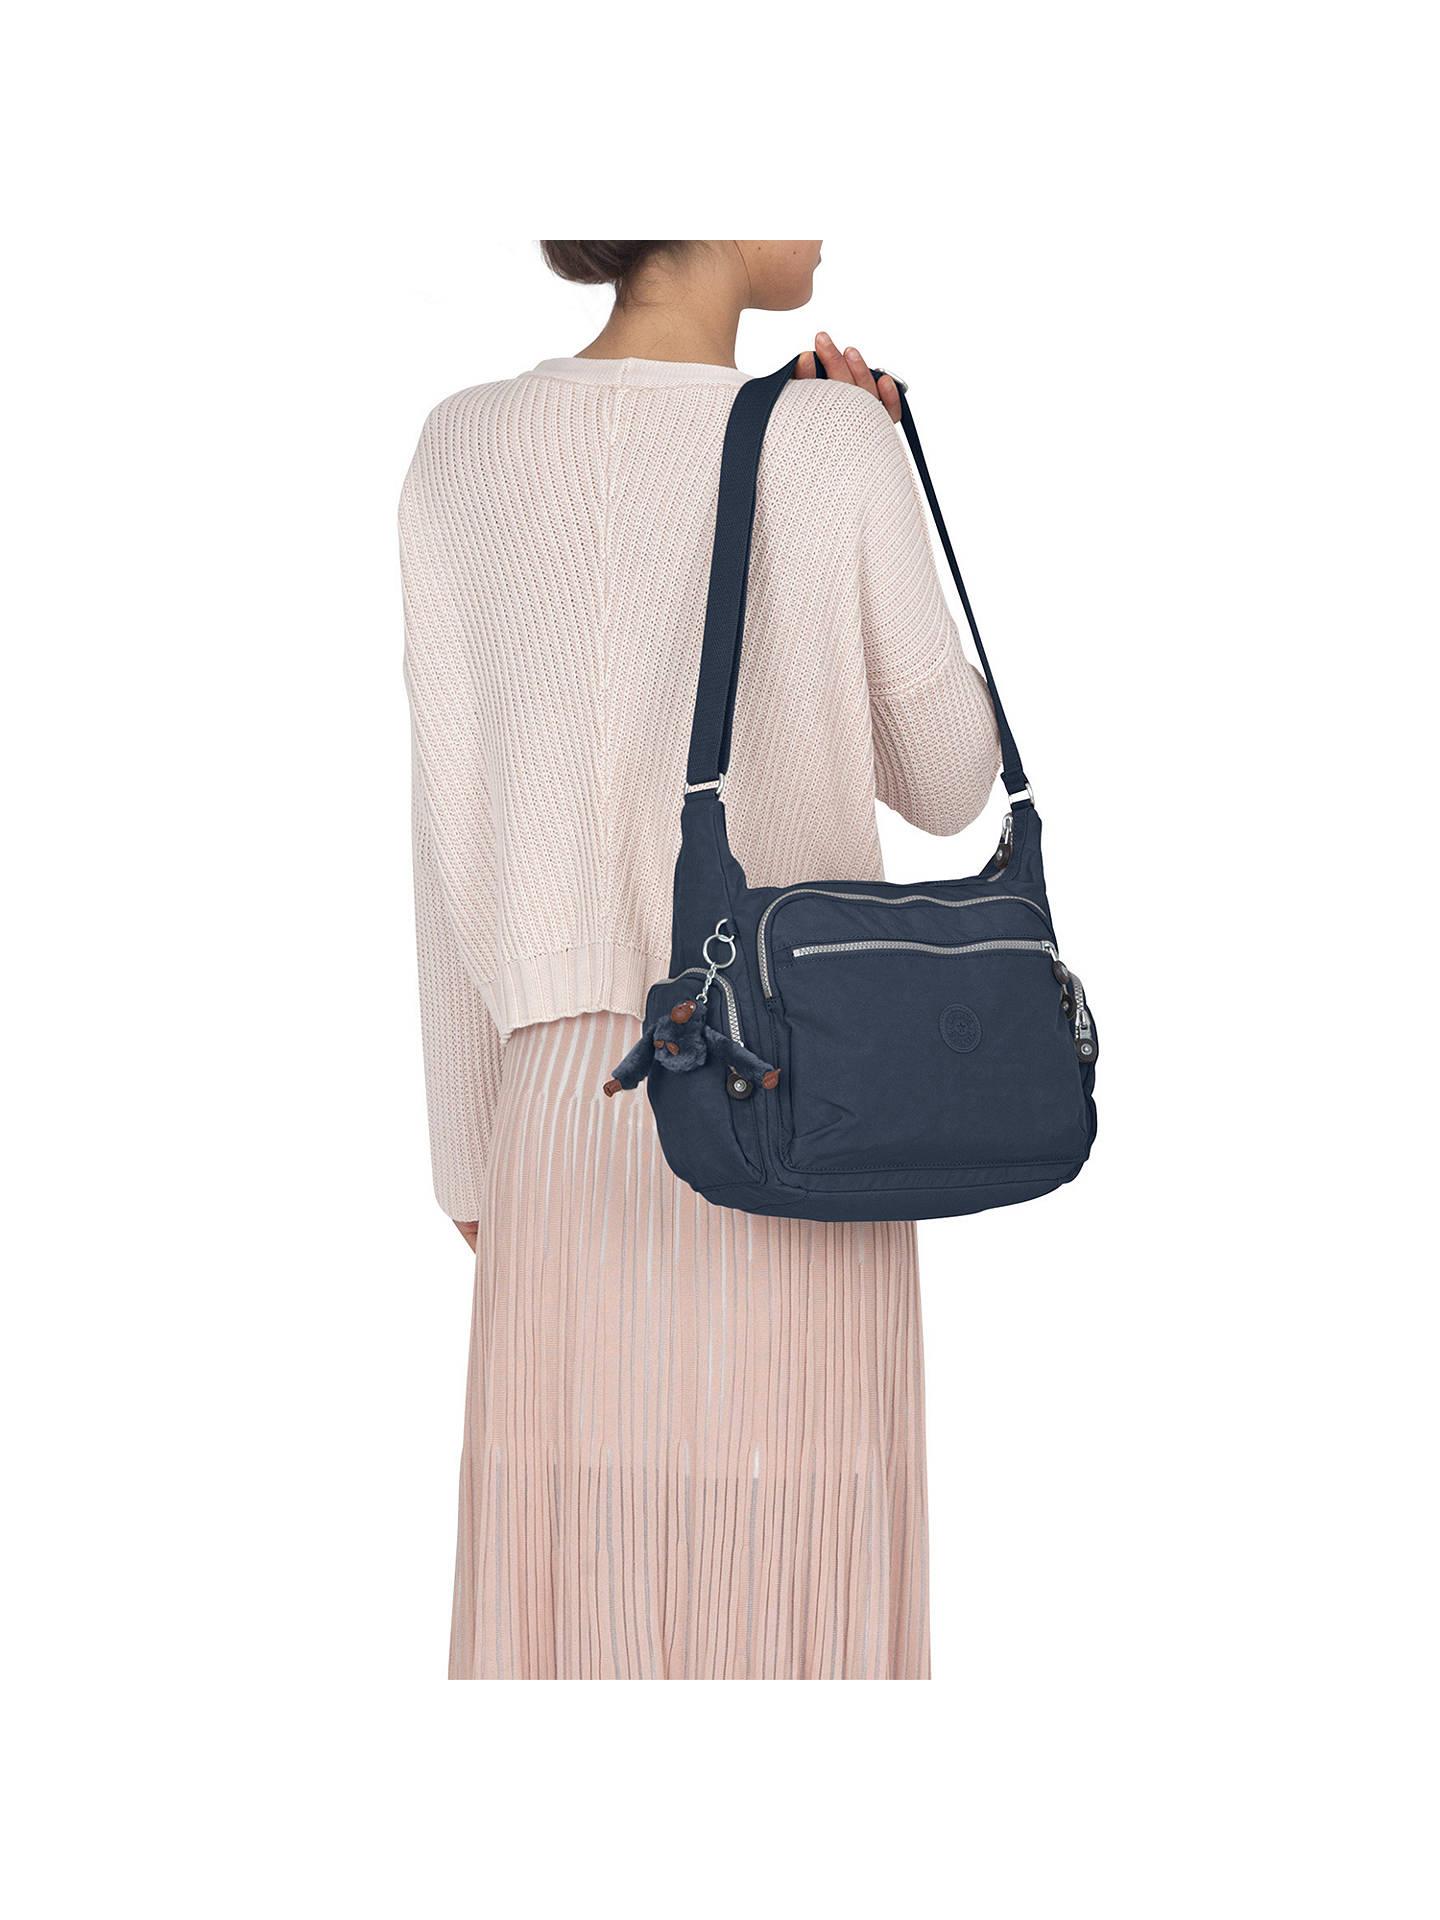 265d9aca17 ... Buy Kipling Gabbie Medium Shoulder Bag, True Blue Online at  johnlewis.com